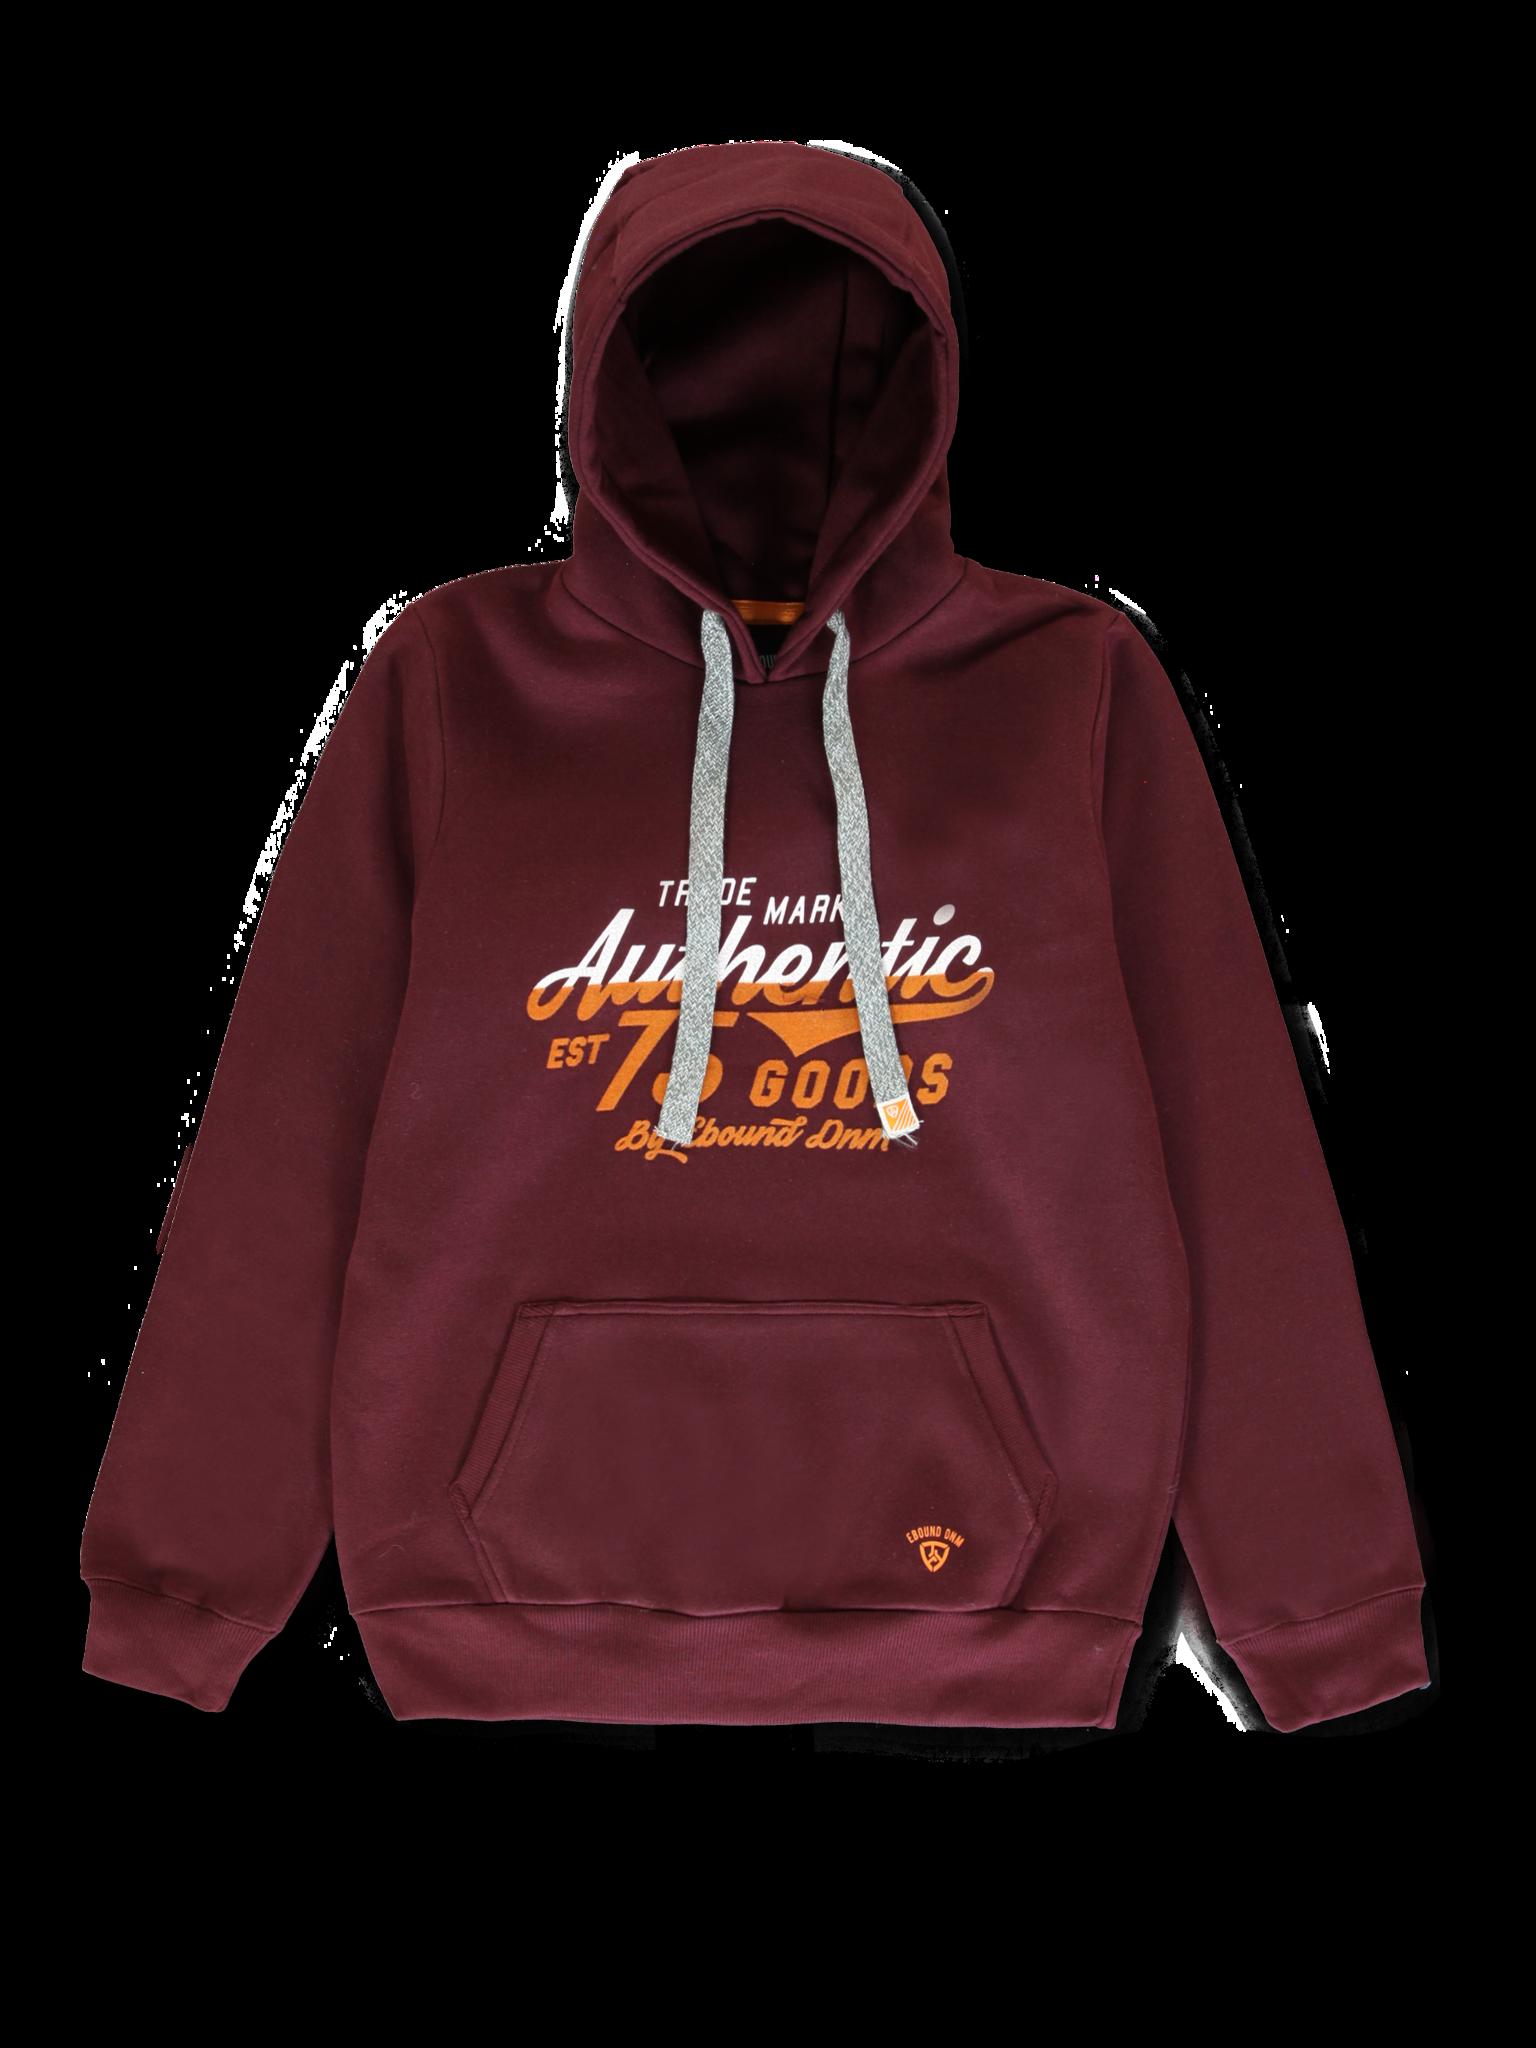 All Brands | Winterproducts Men | Sweatshirt | 15 pcs/box